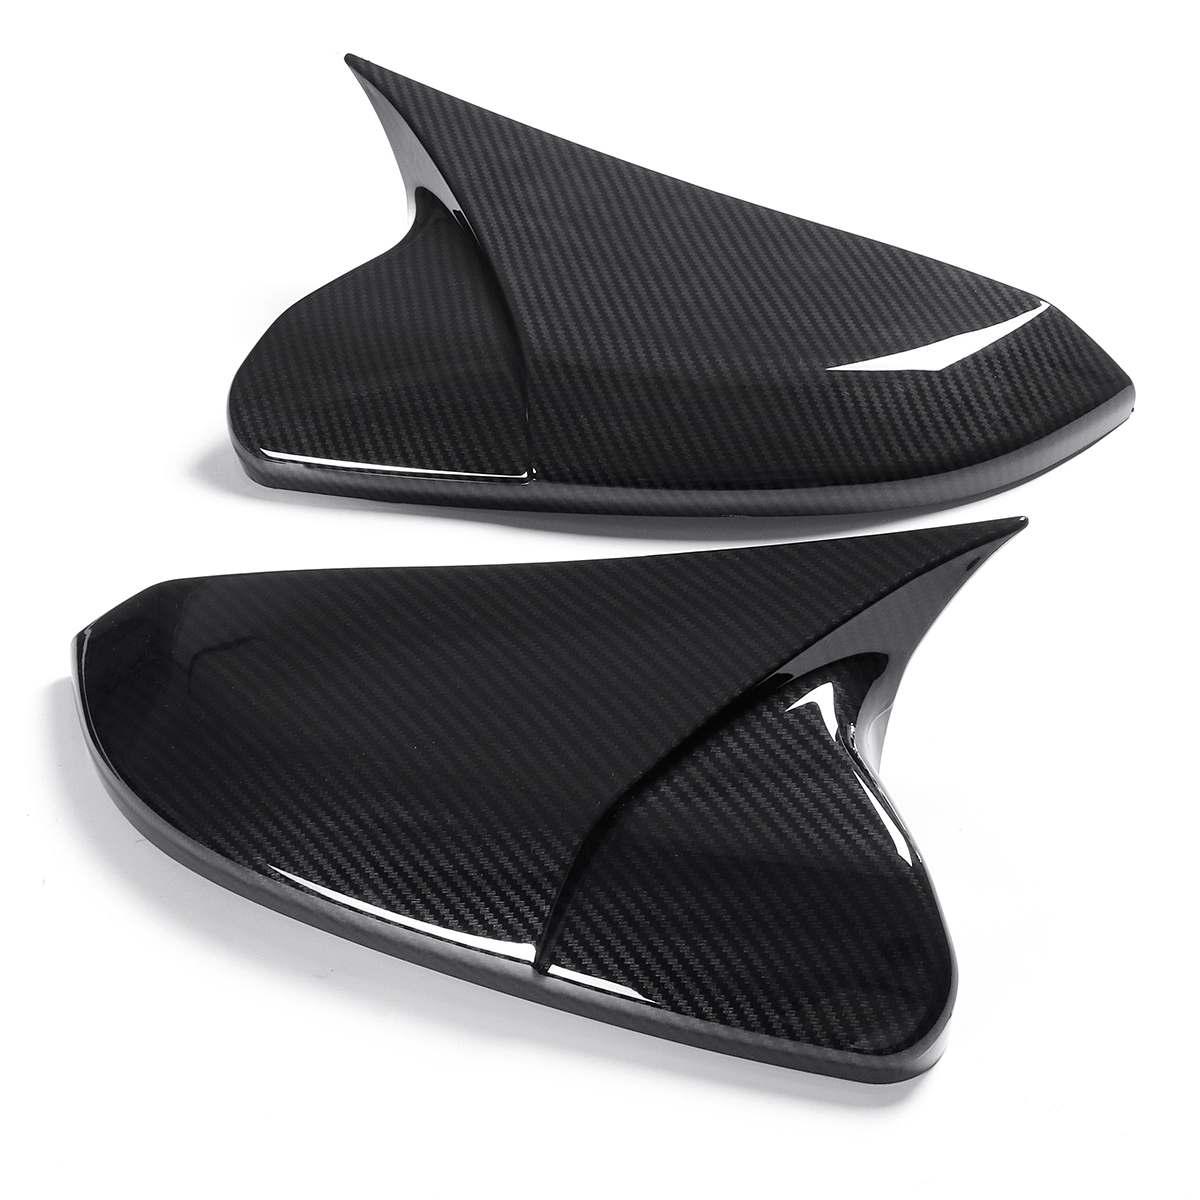 Форма рога ABS углеродное волокно стиль заднего вида боковое зеркало крышки заднего вида для Honda Для Civic 10th 2016 2017 2018 2019